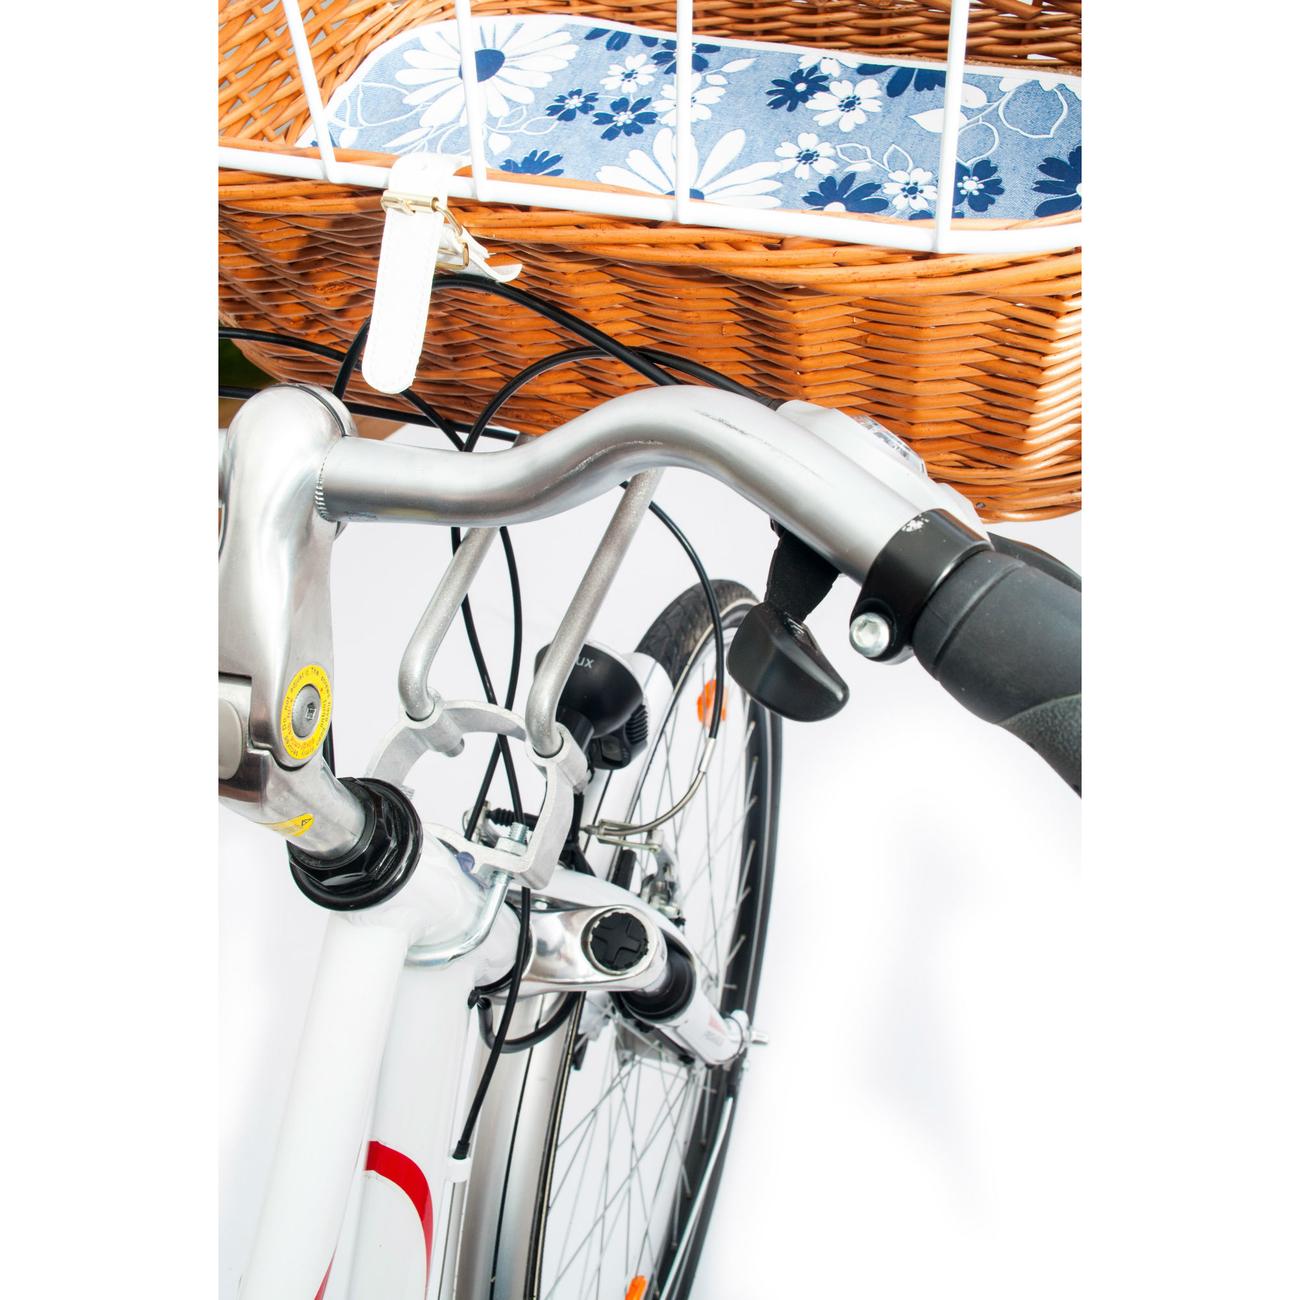 Aumüller E-Bike Hunde Fahrradkorb Standard vorne, Bild 13